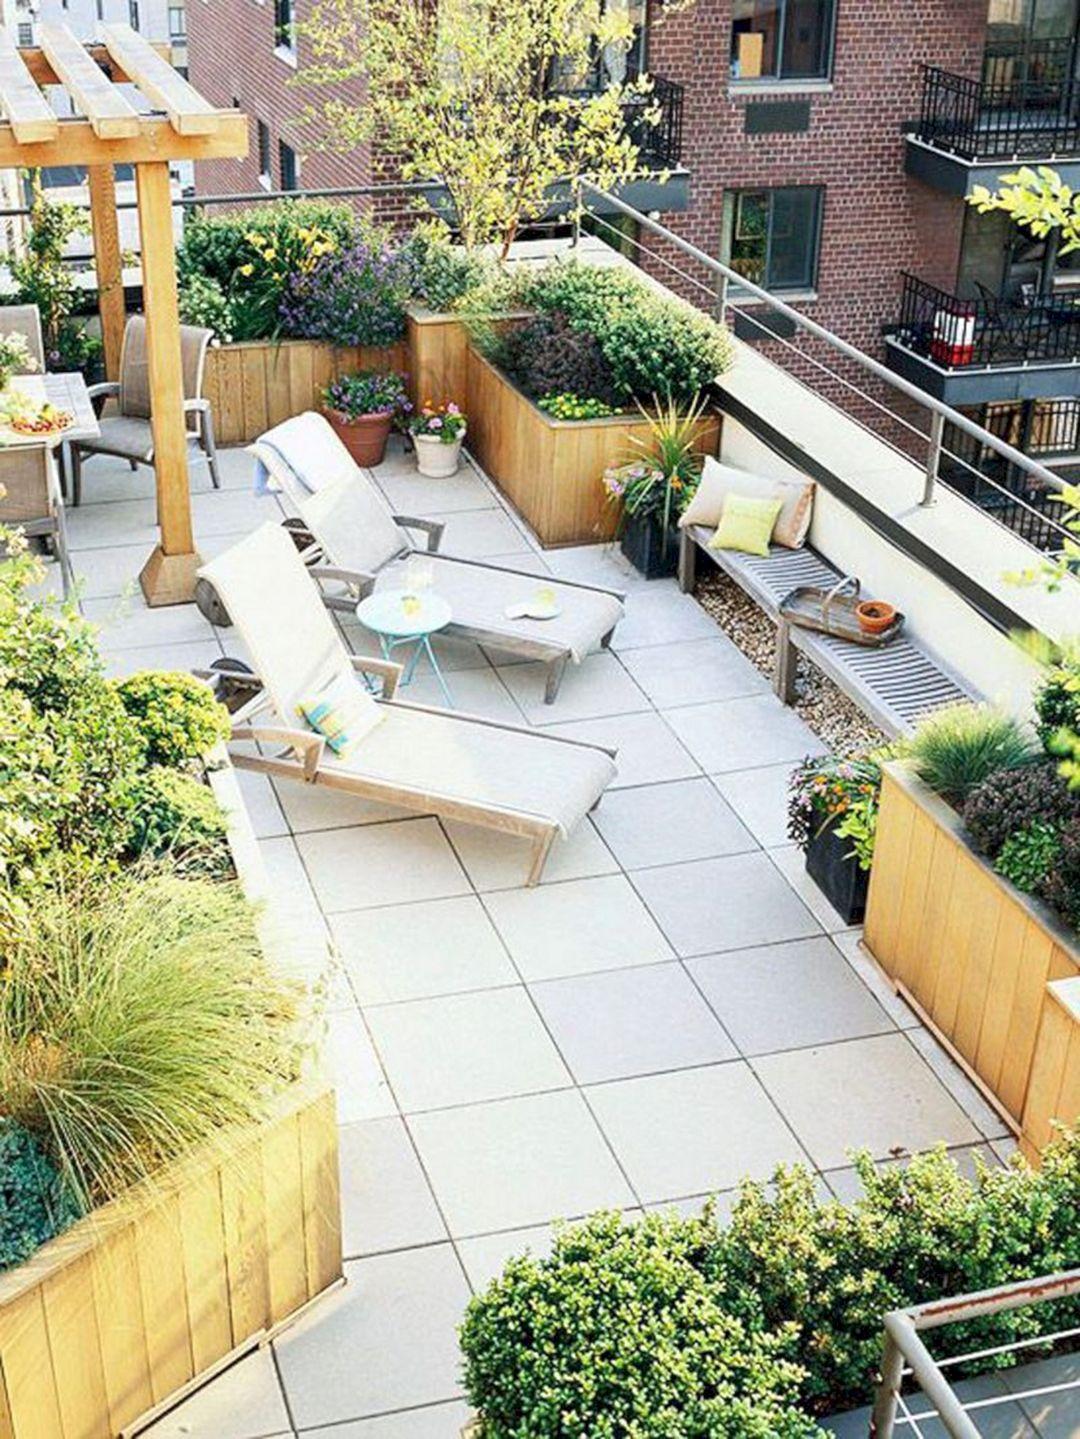 12+ Beautiful Home Terrace Garden Ideas That Will Make You More Comfortable Relaxing